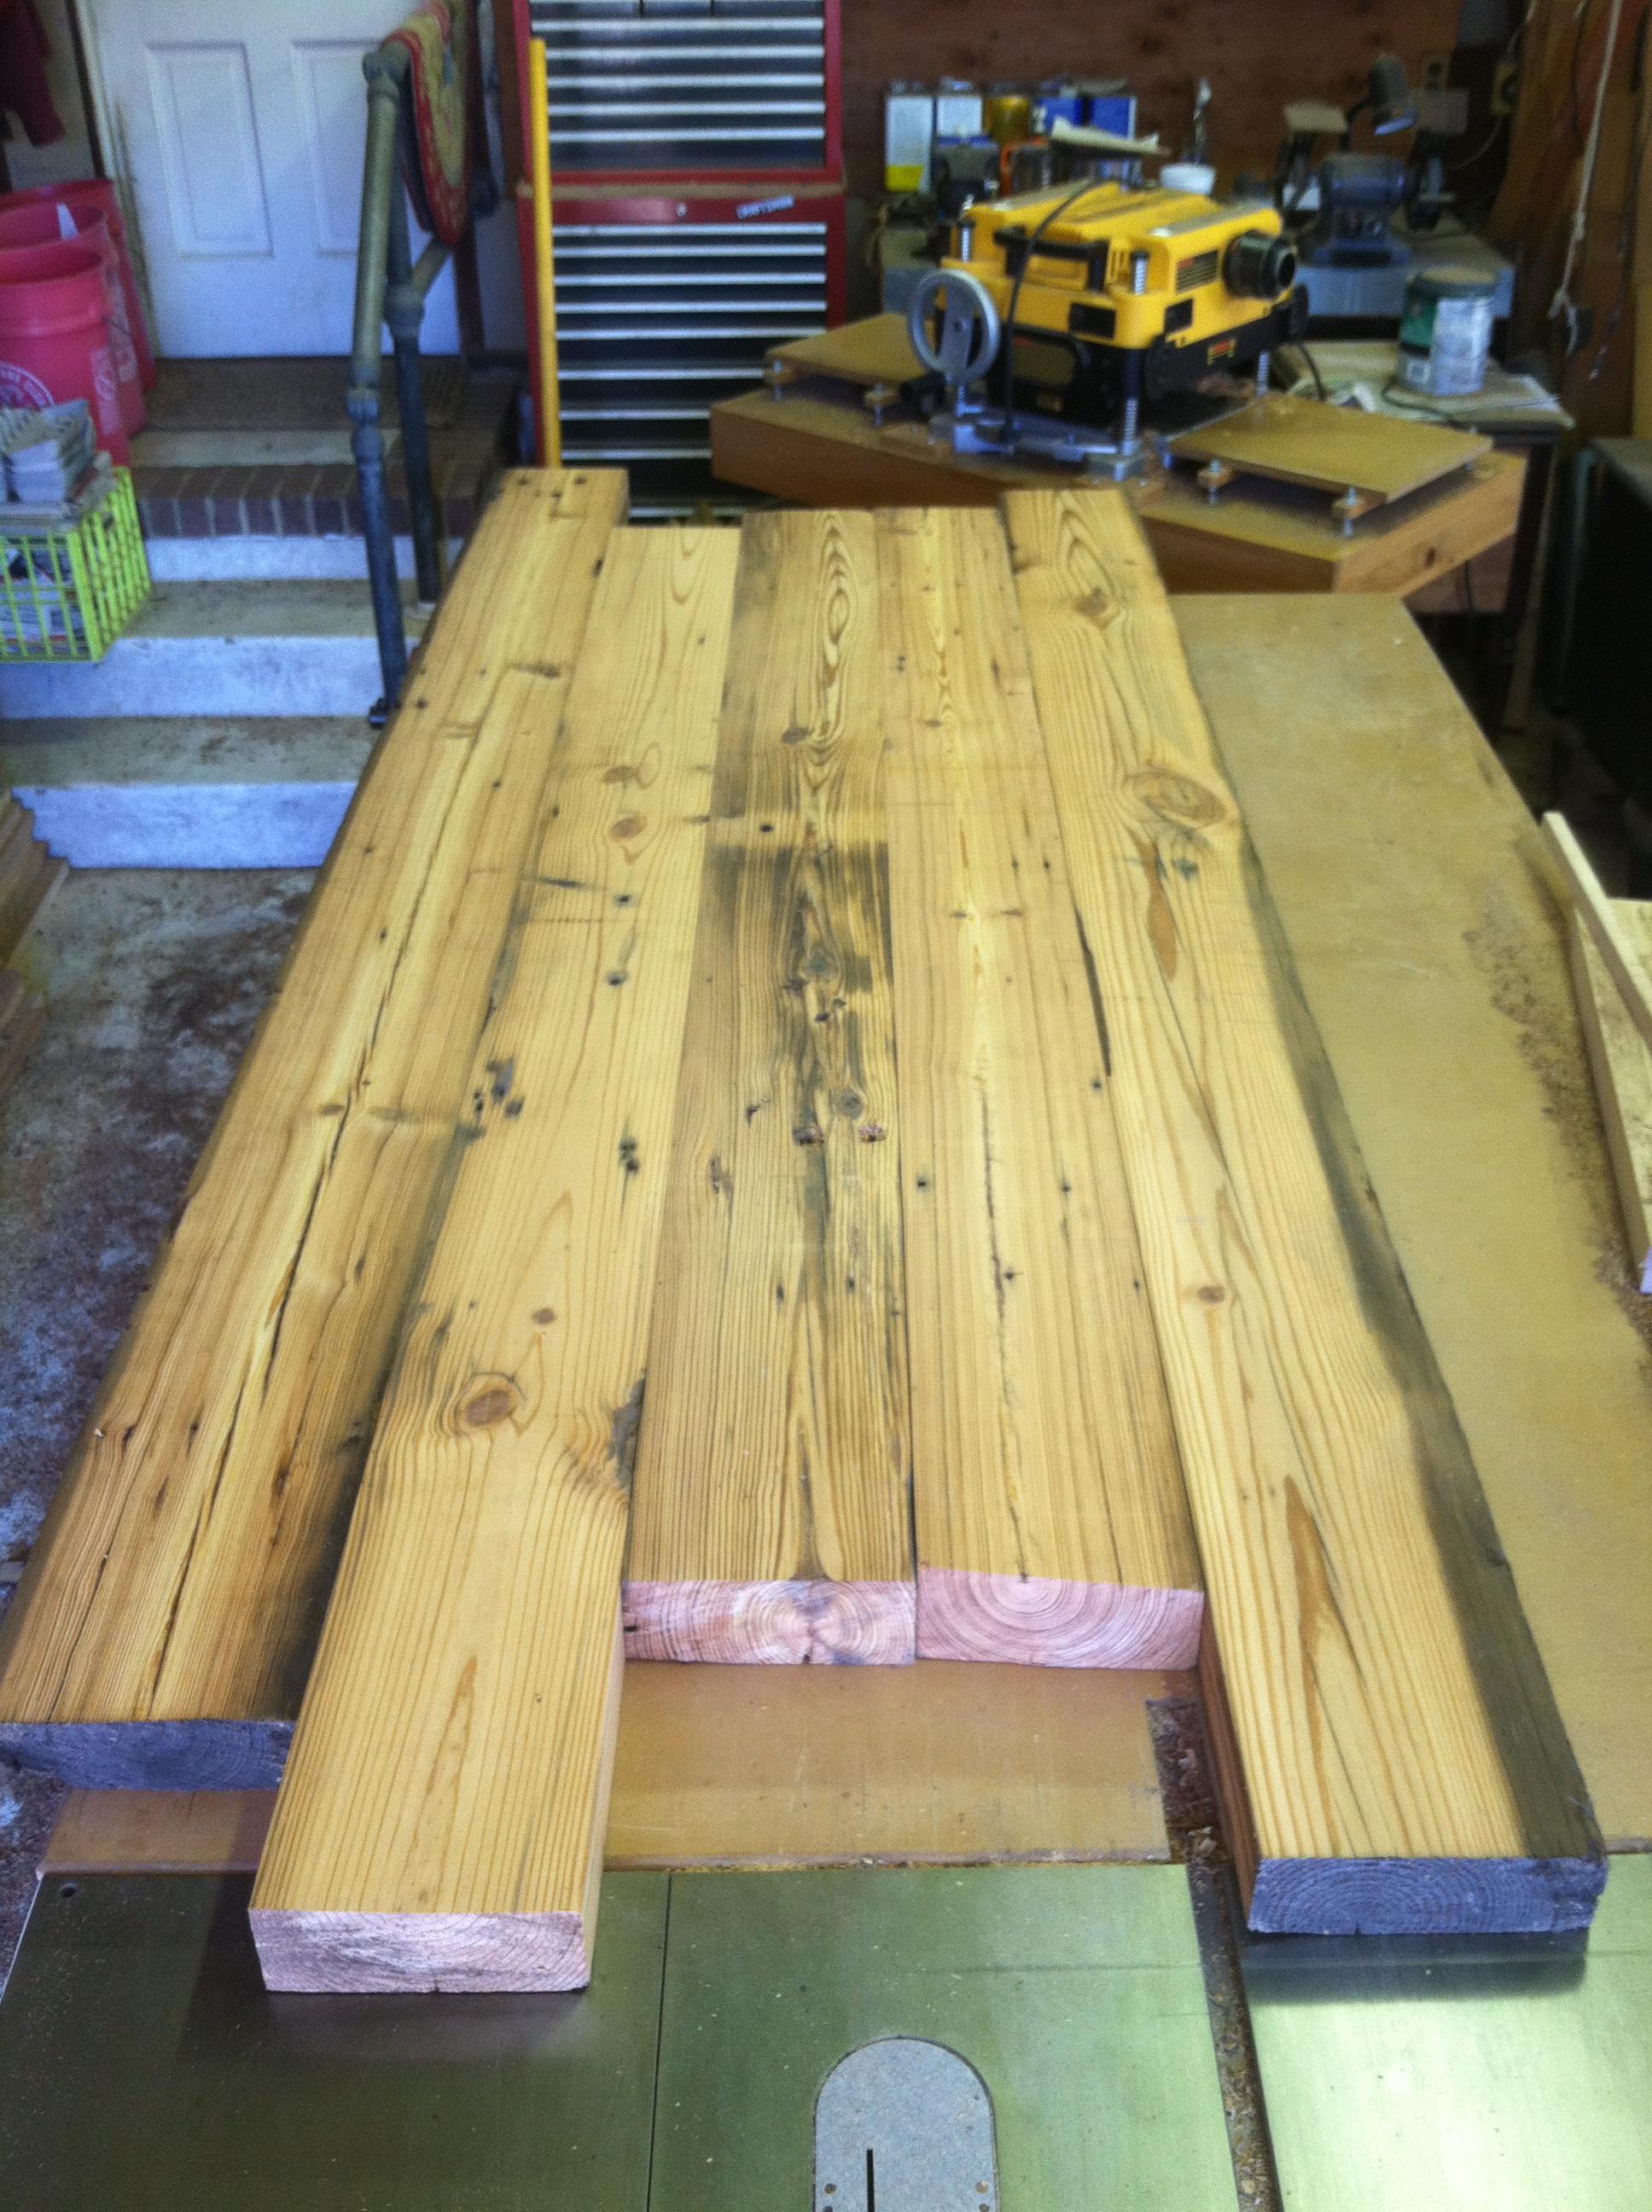 Tabletop boards